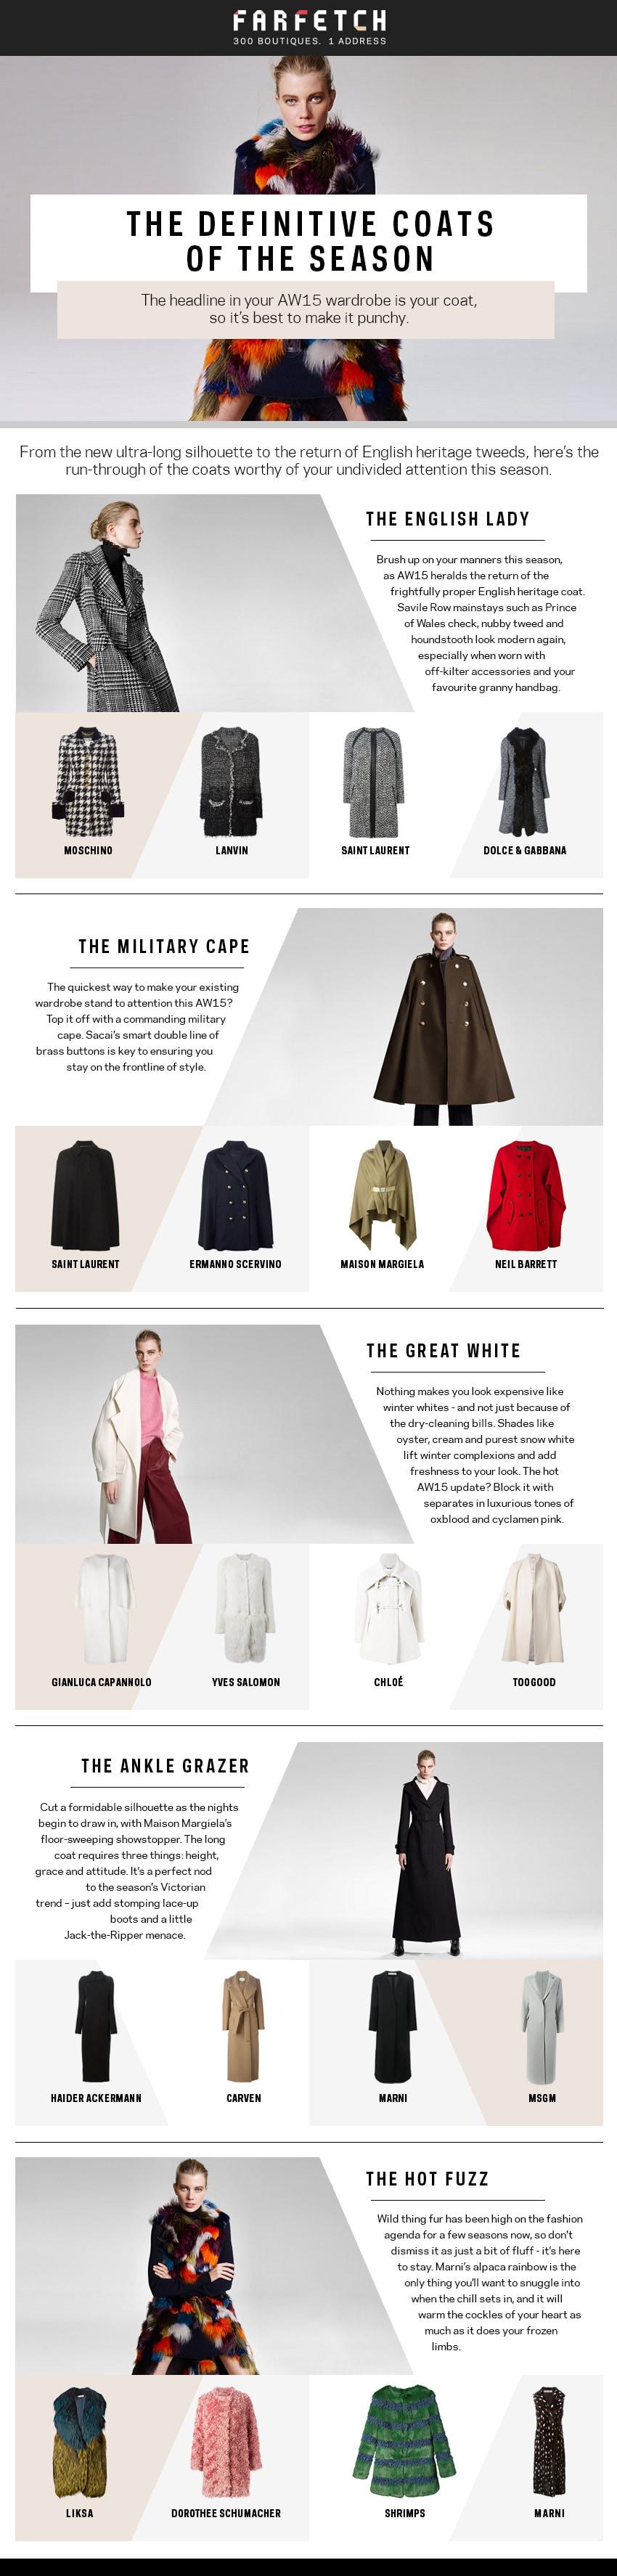 The Definitive Coats of the Season